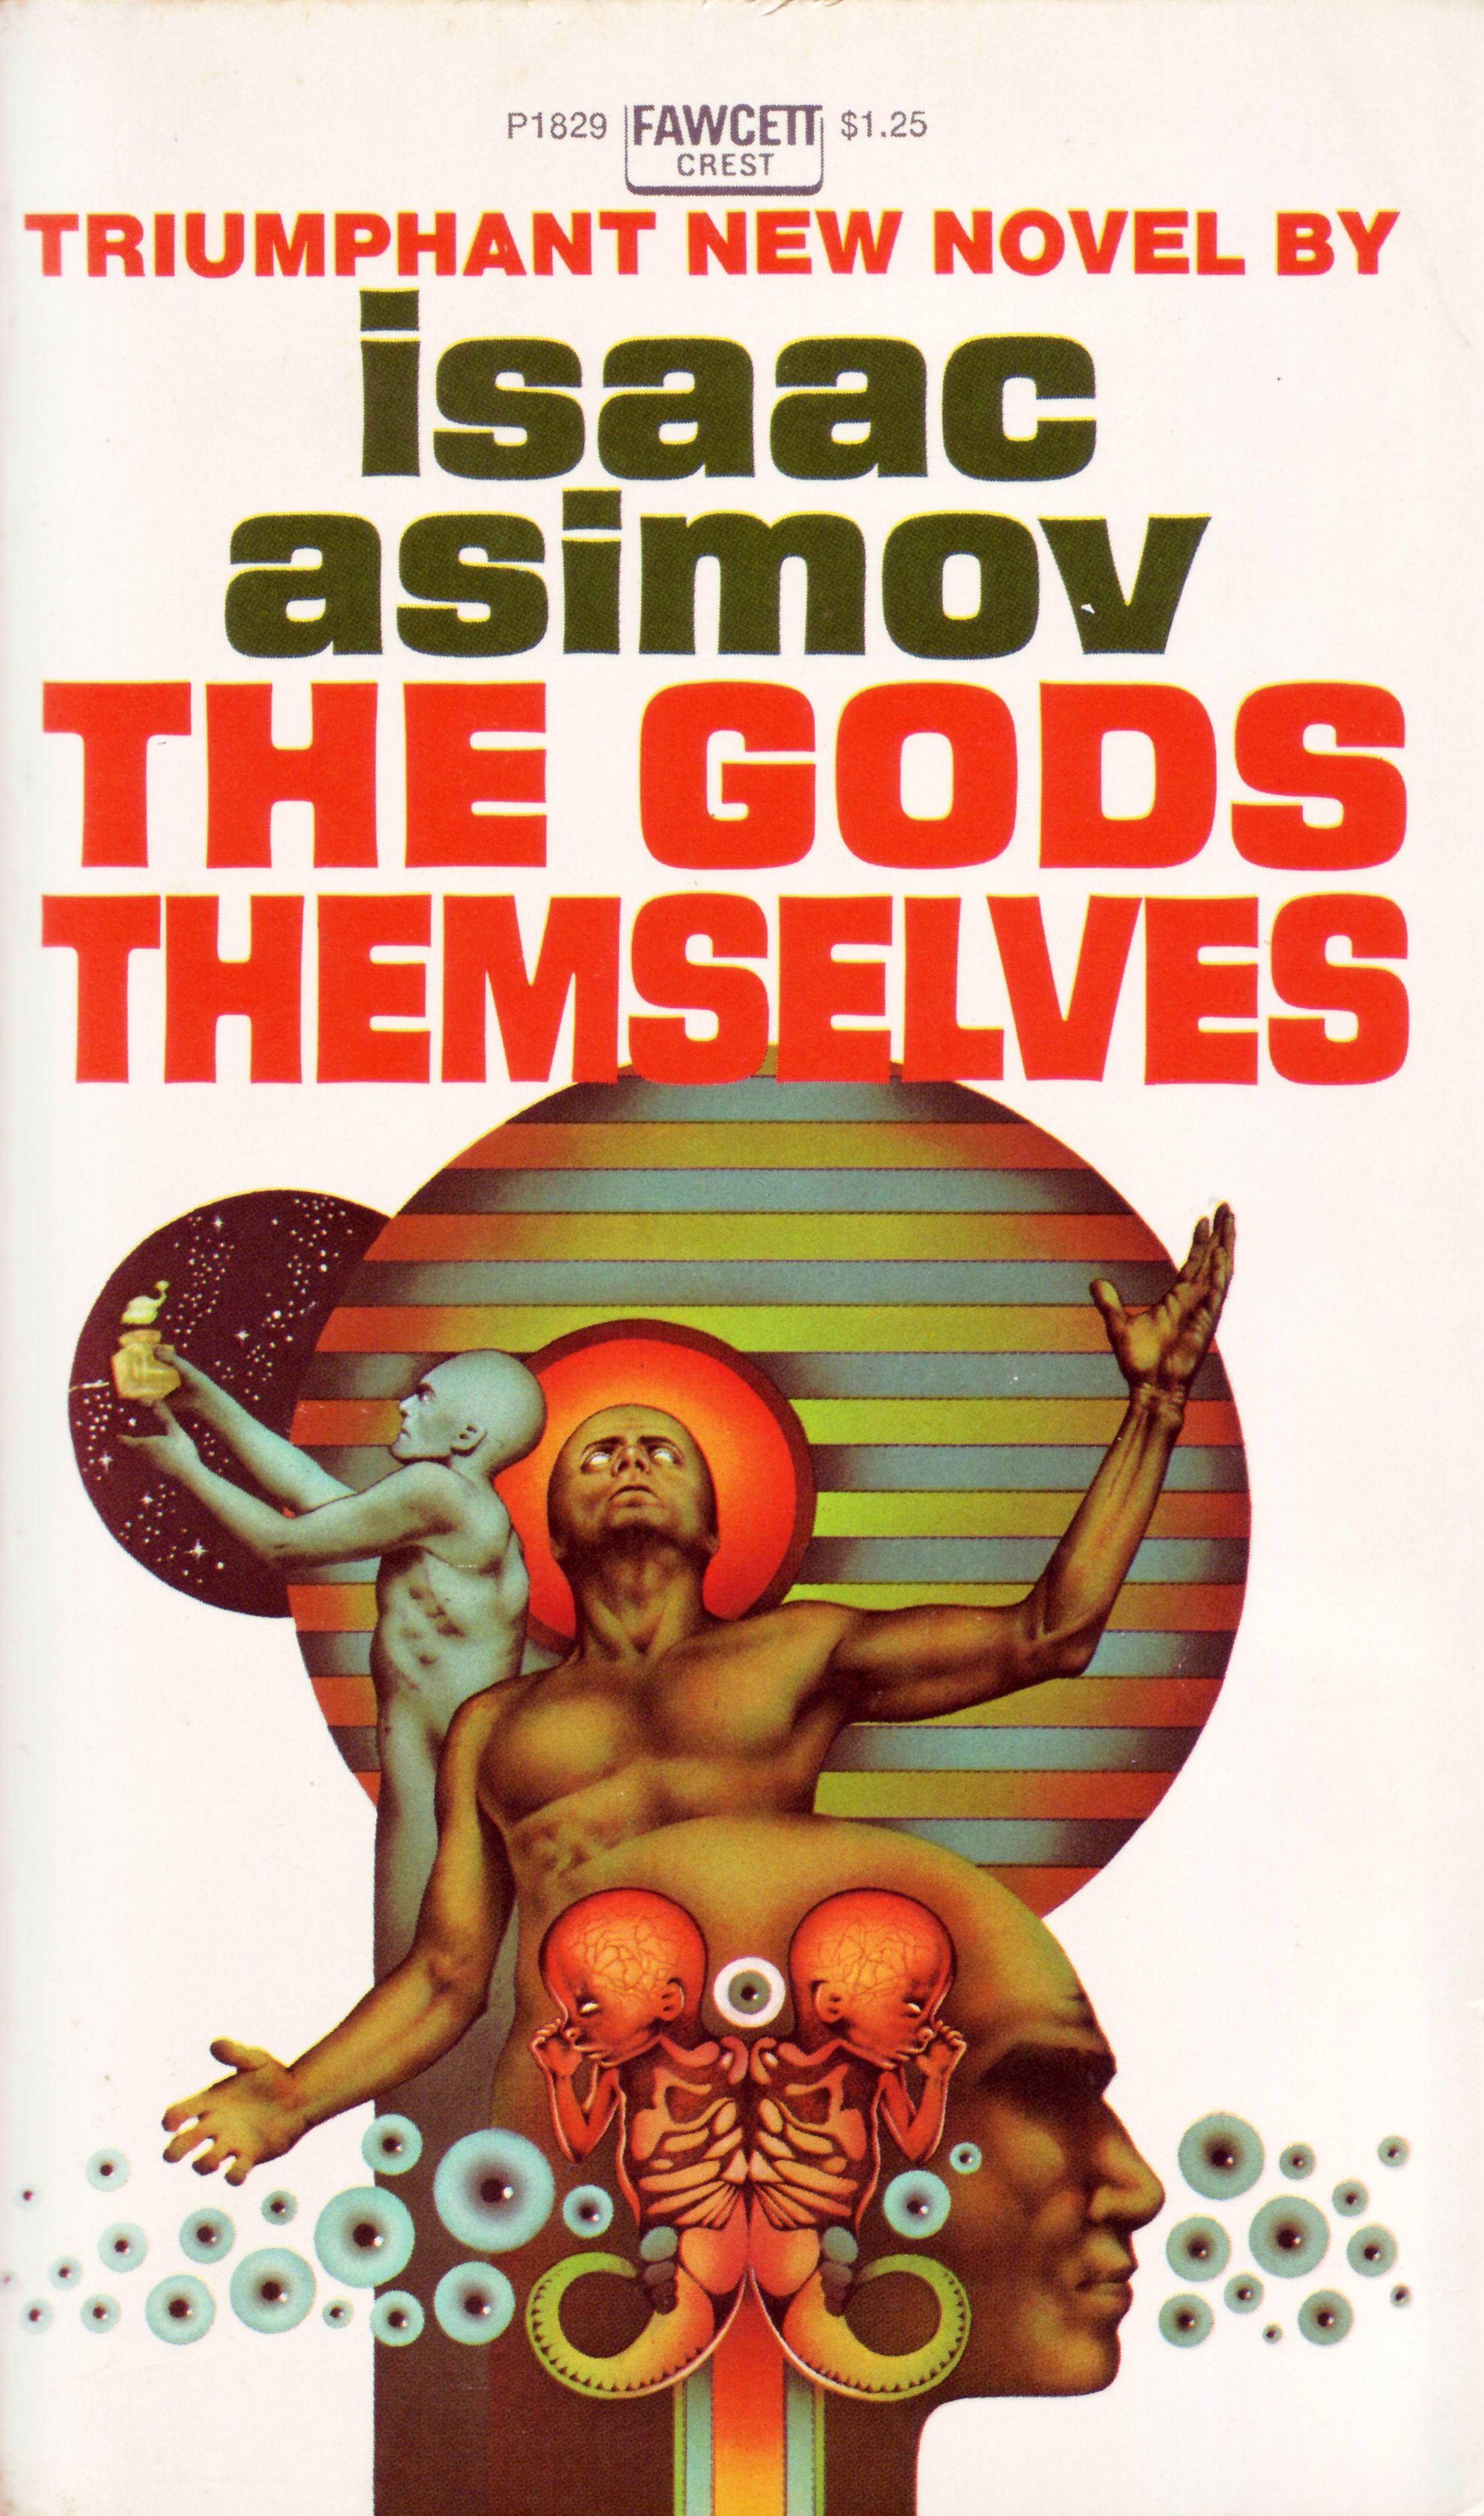 the god themselves asimov